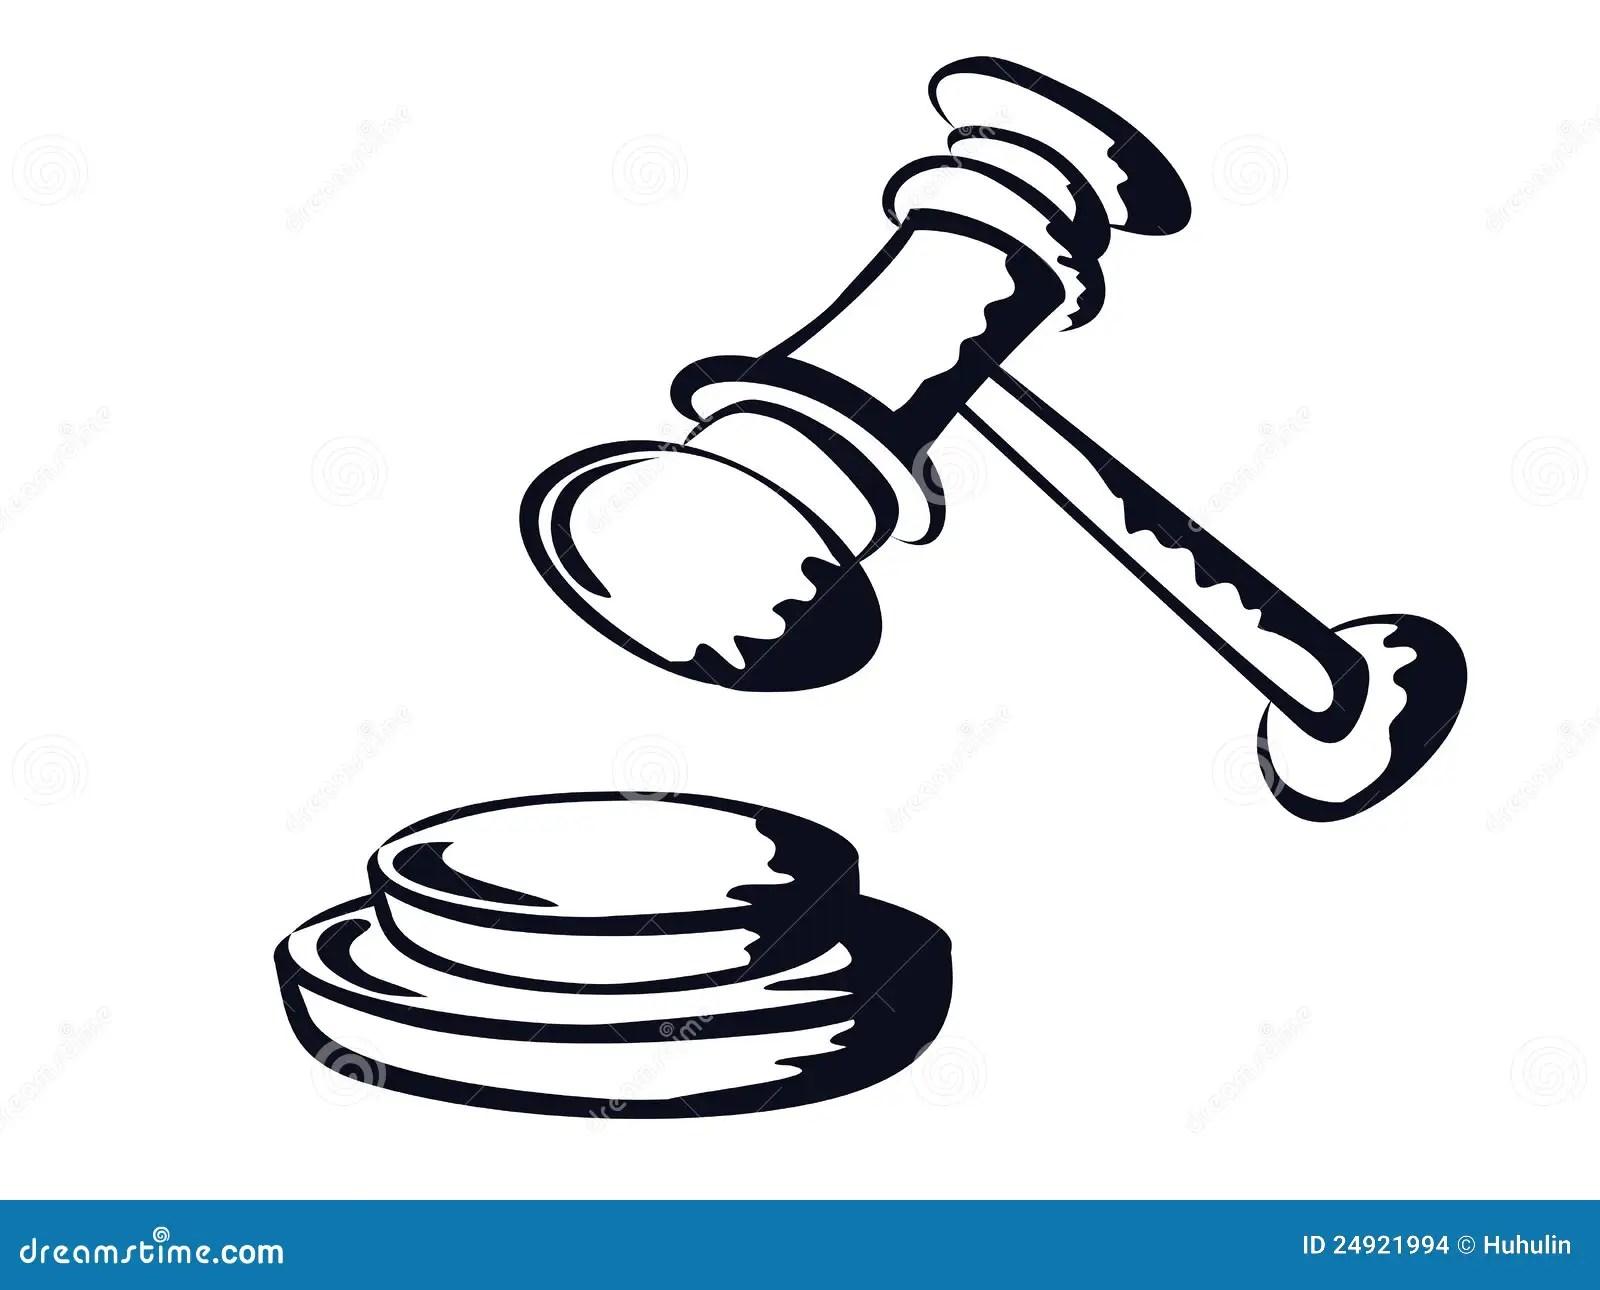 Judge Gavel Sketch Shape Vector From Stock Vector